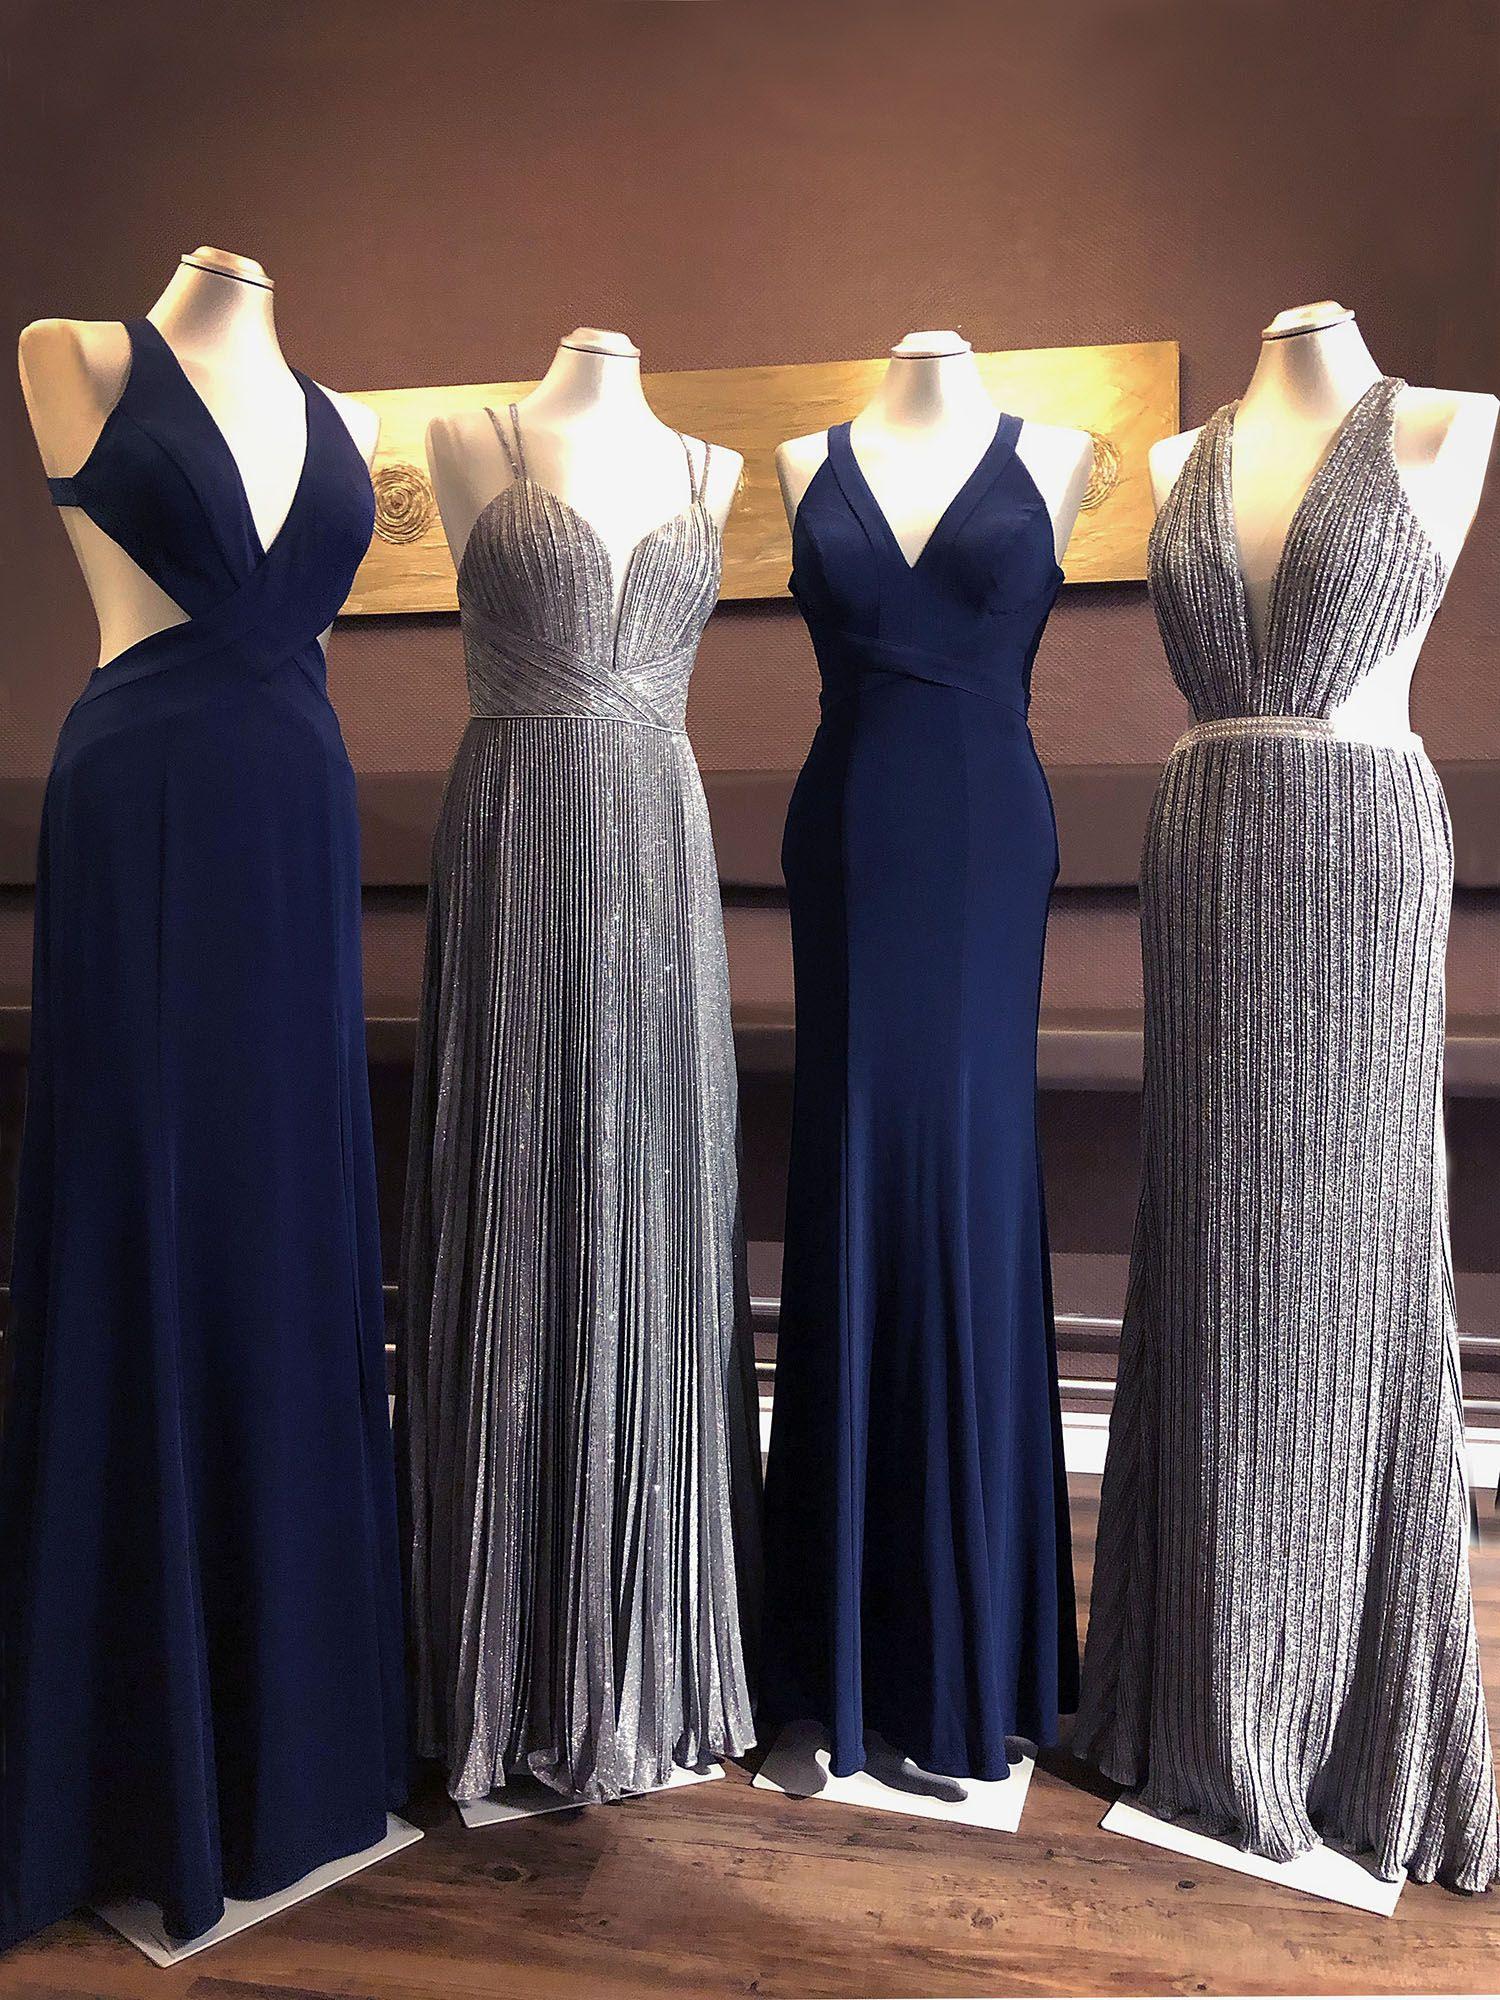 15 Wunderbar Unique Abendkleid Aus Satin DesignAbend Luxurius Unique Abendkleid Aus Satin Vertrieb